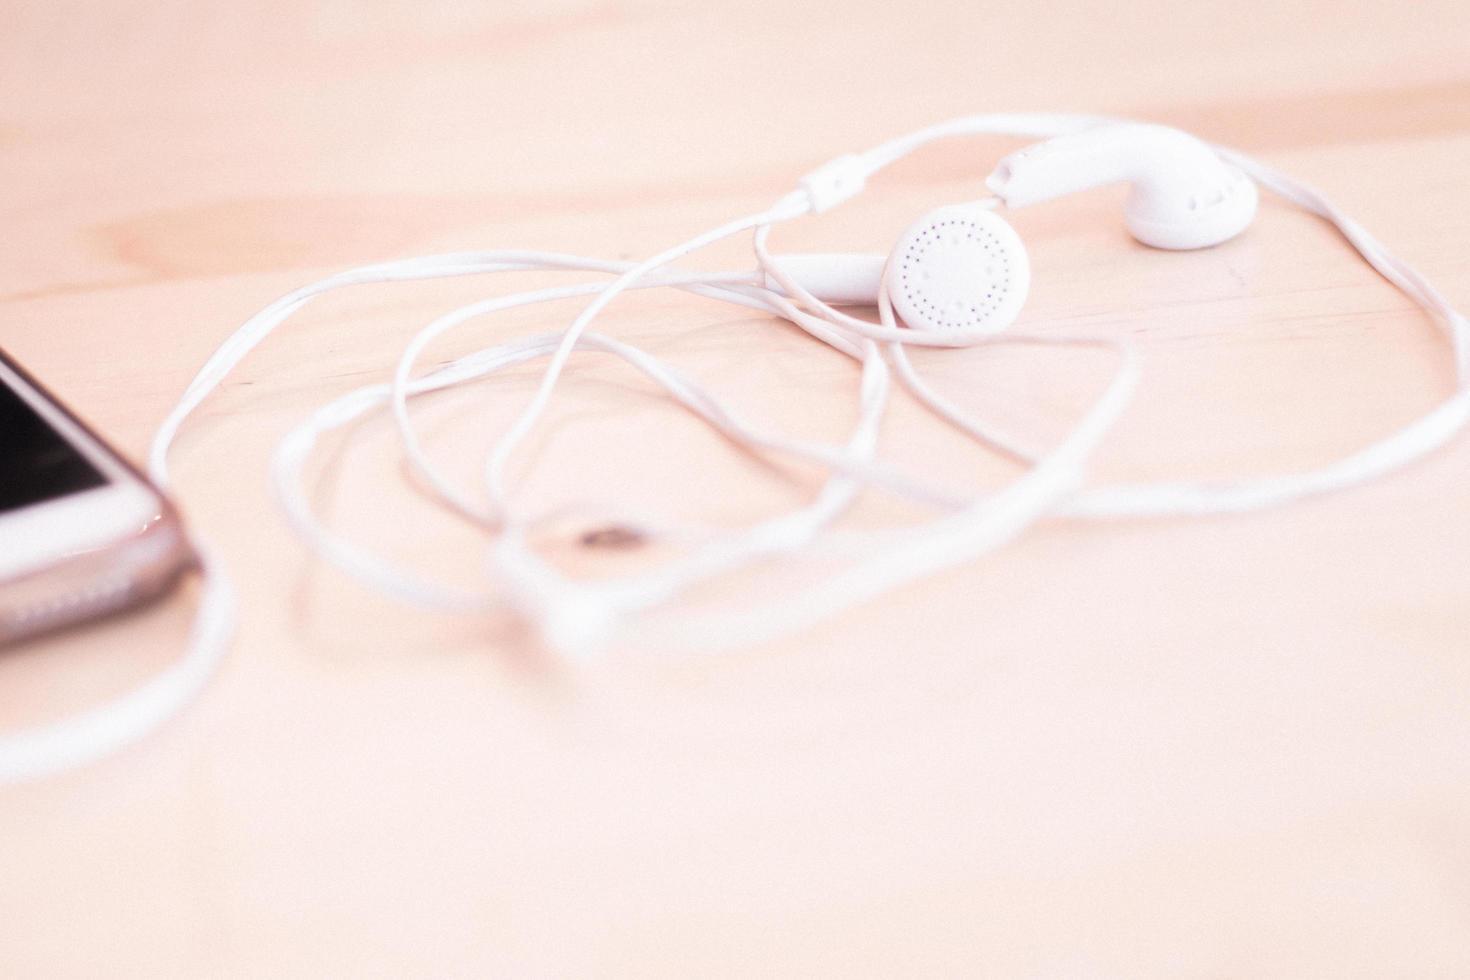 witte oortelefoons op neutrale achtergrond foto